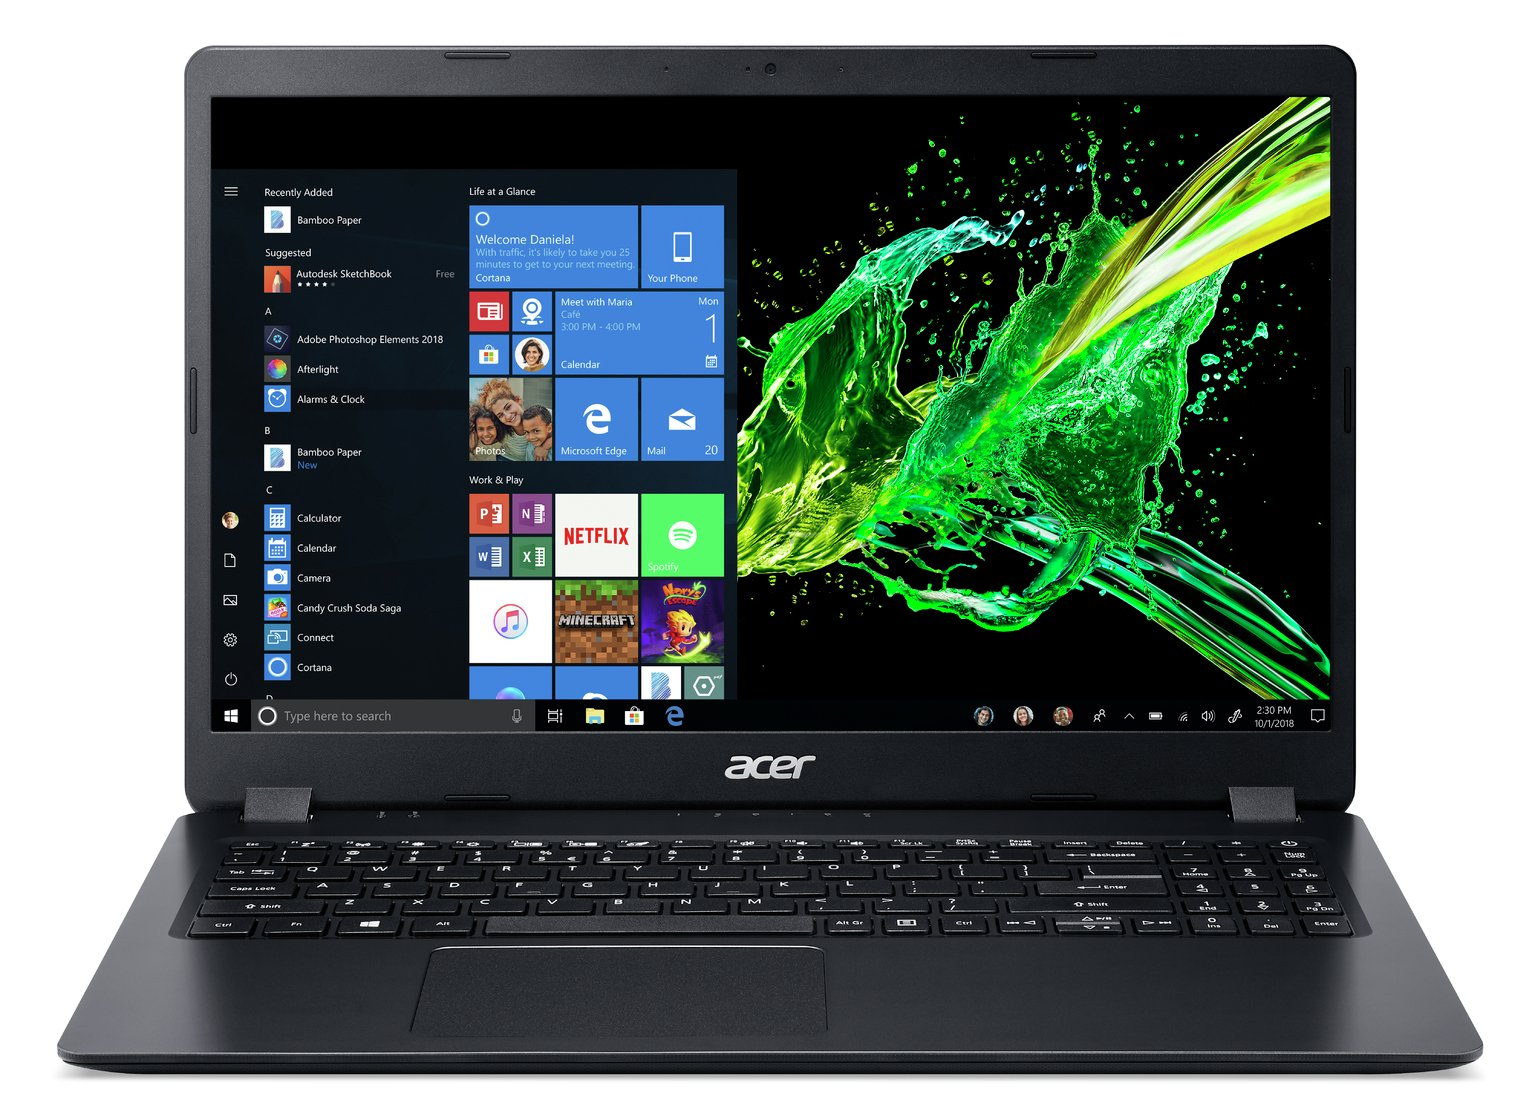 Acer Aspire 3 15.6in i3 8GB 1TB Laptop - Black